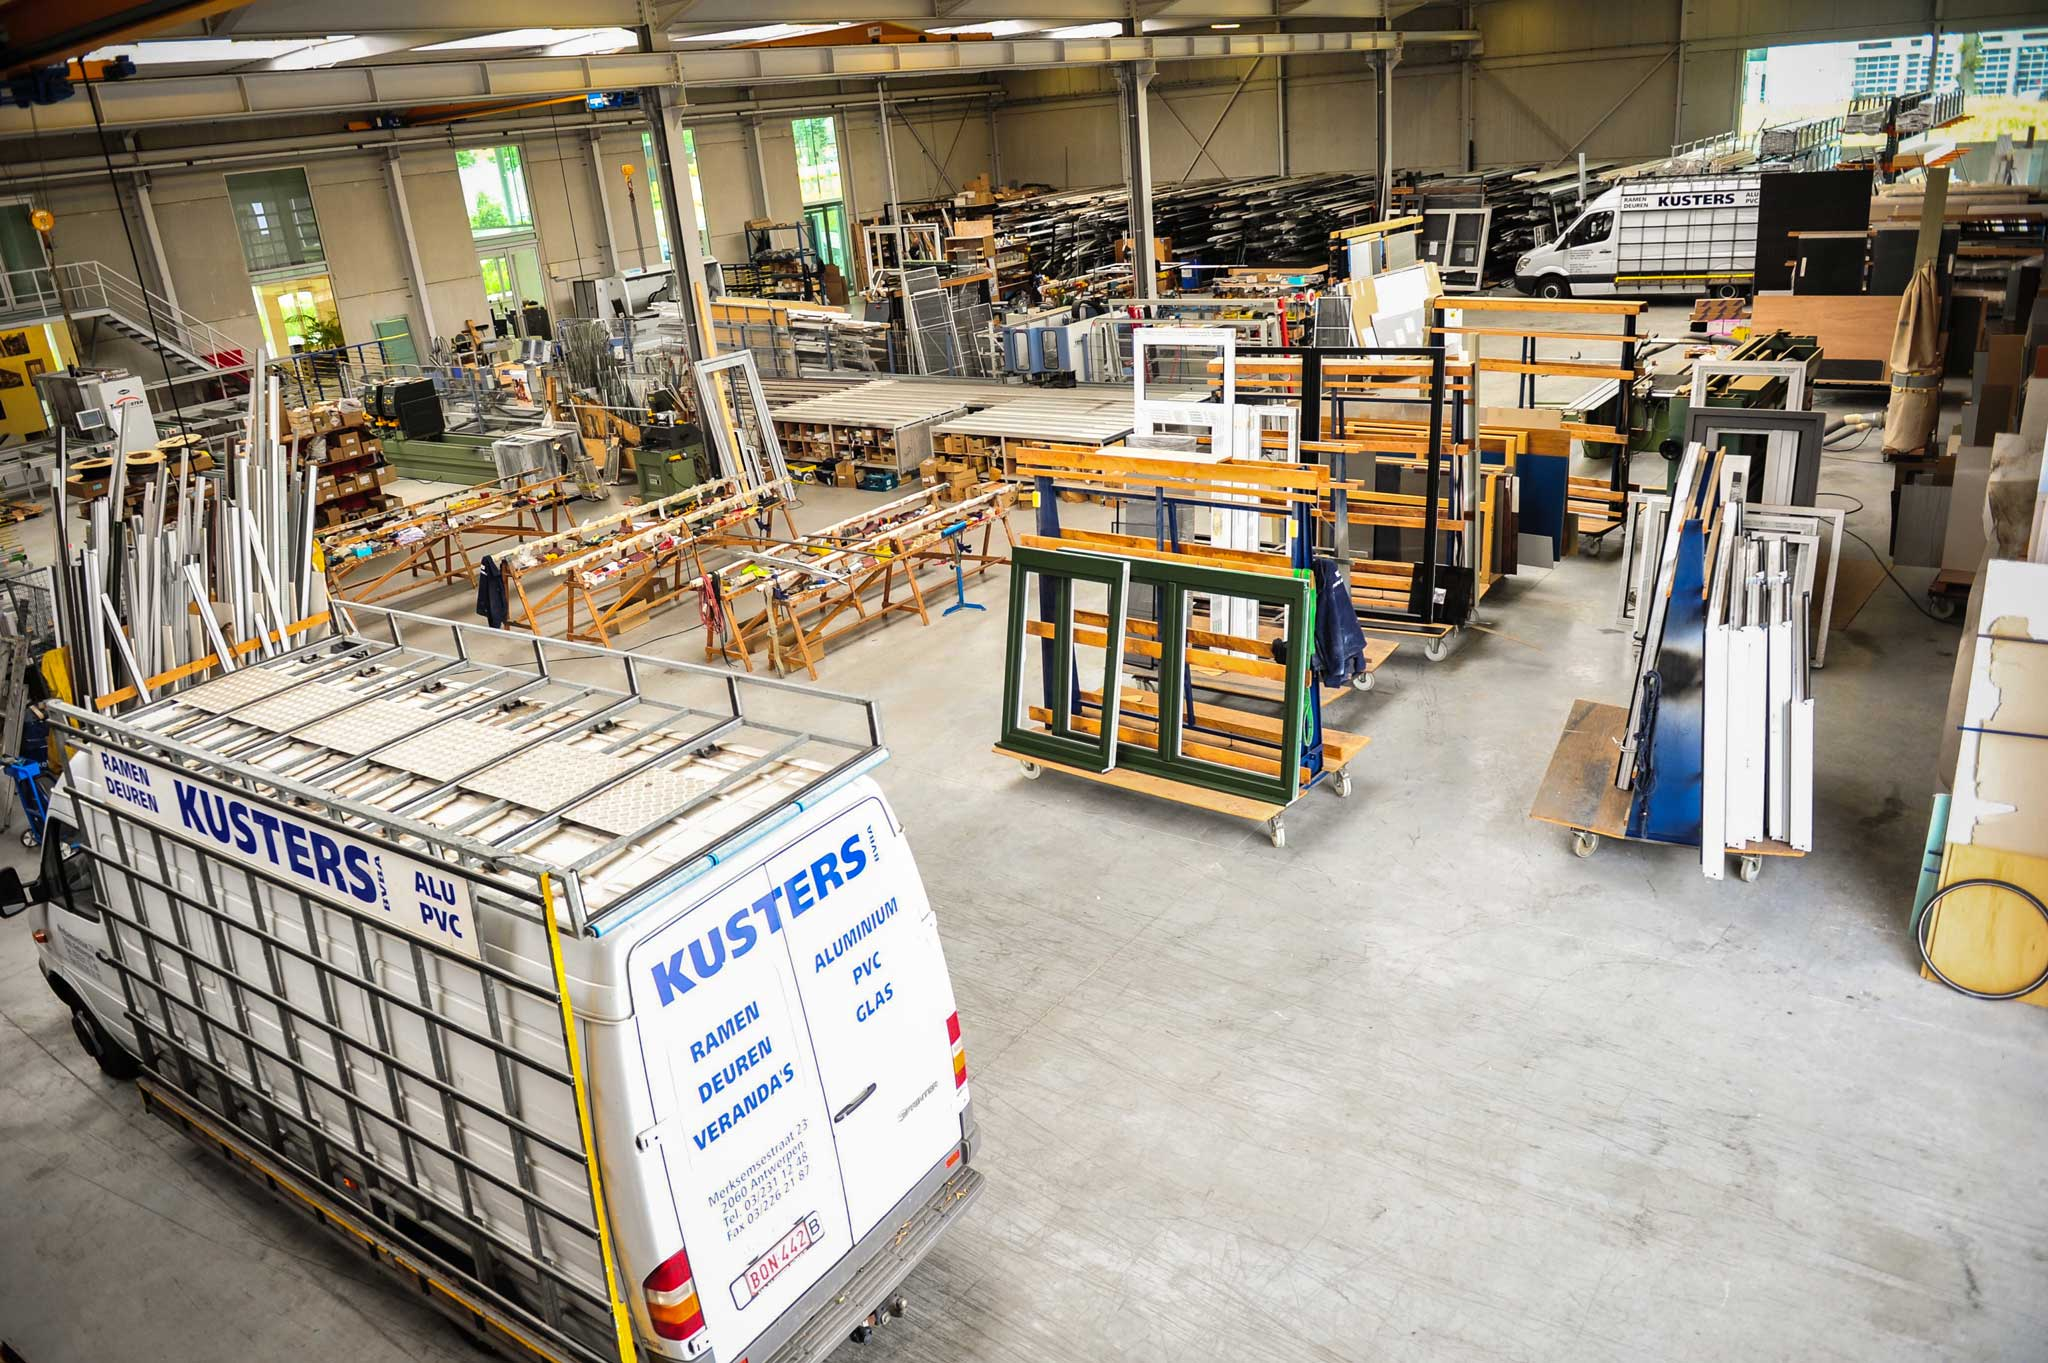 Kusters fabriek Antwerpen